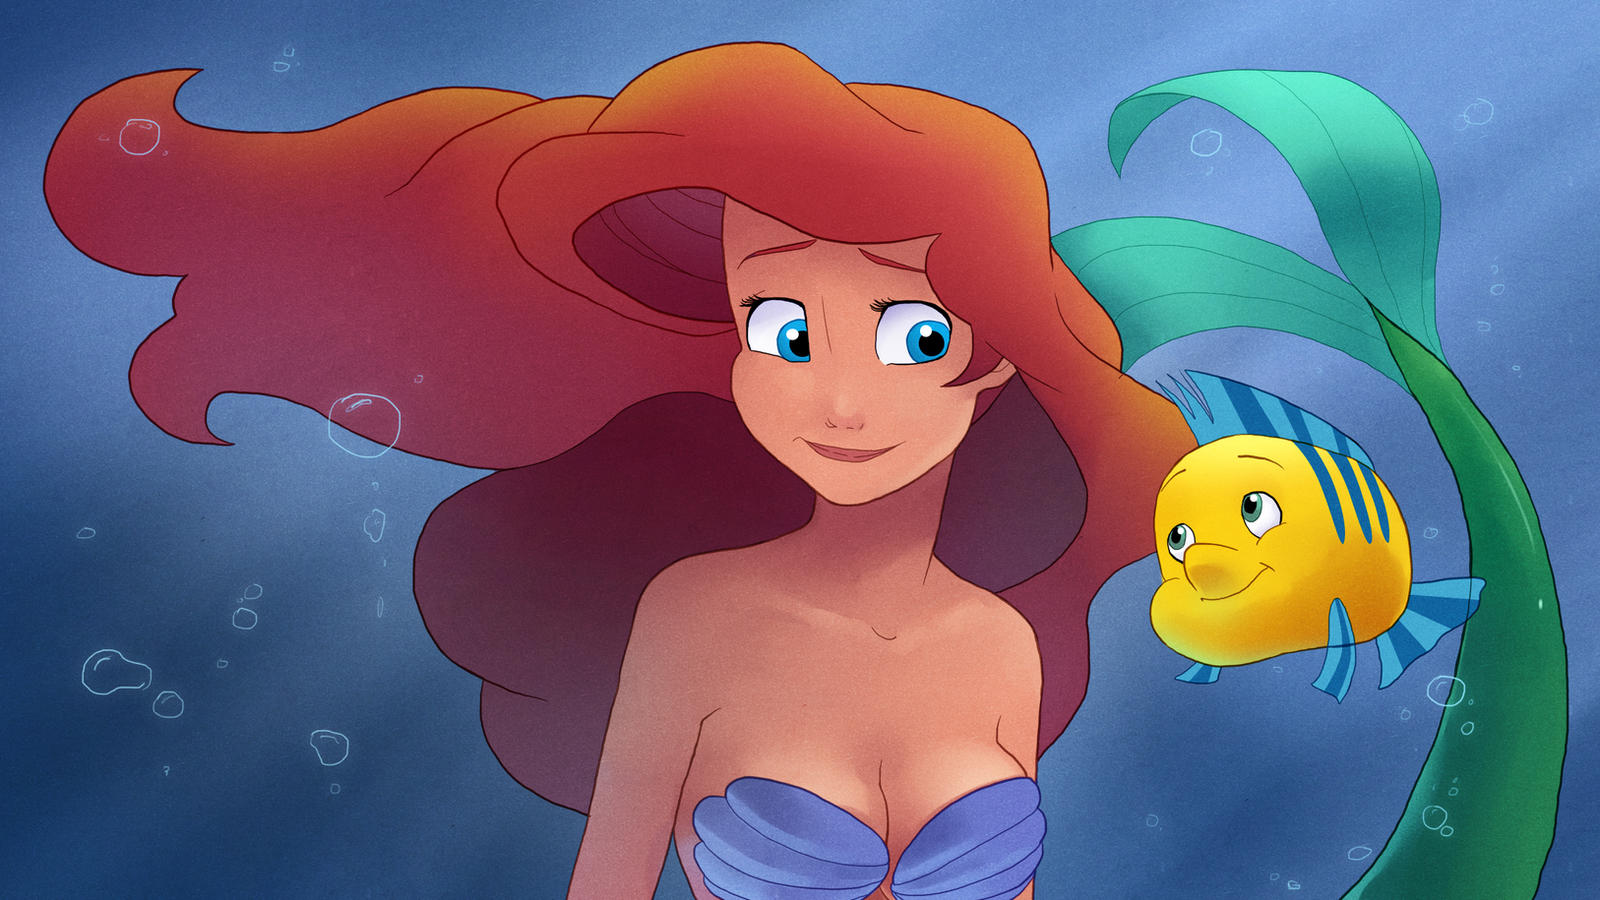 Uncategorized Flounder And Ariel ariel and flounder by moxie2d on deviantart moxie2d